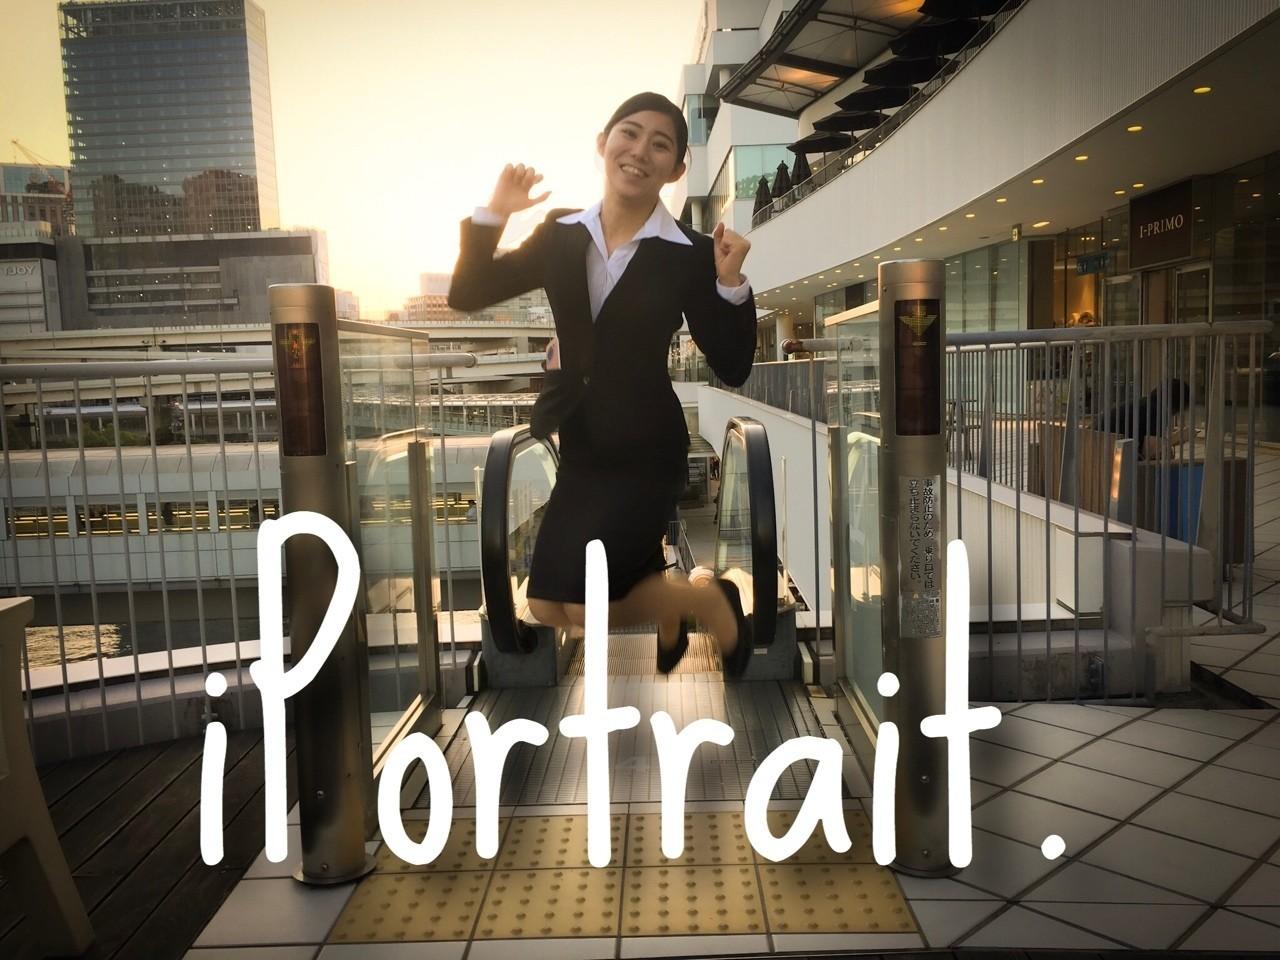 【iPortrait.】